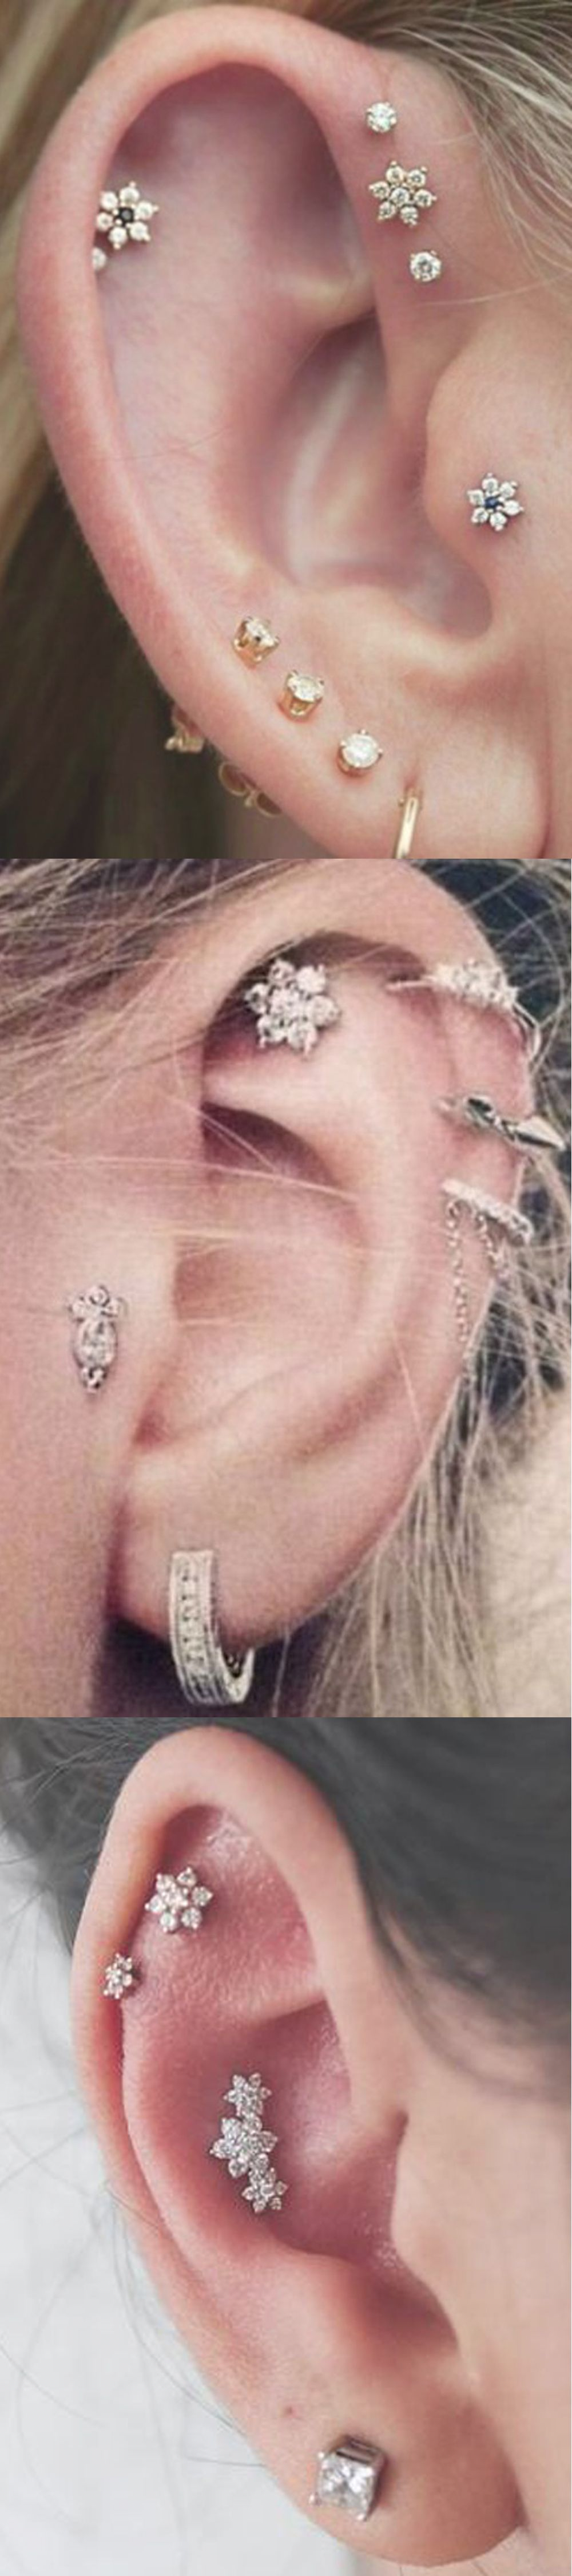 Swollen daith piercing bump  Cute Multiple Ear Piercing Ideas at MyBodiArt  Felicity Crystal